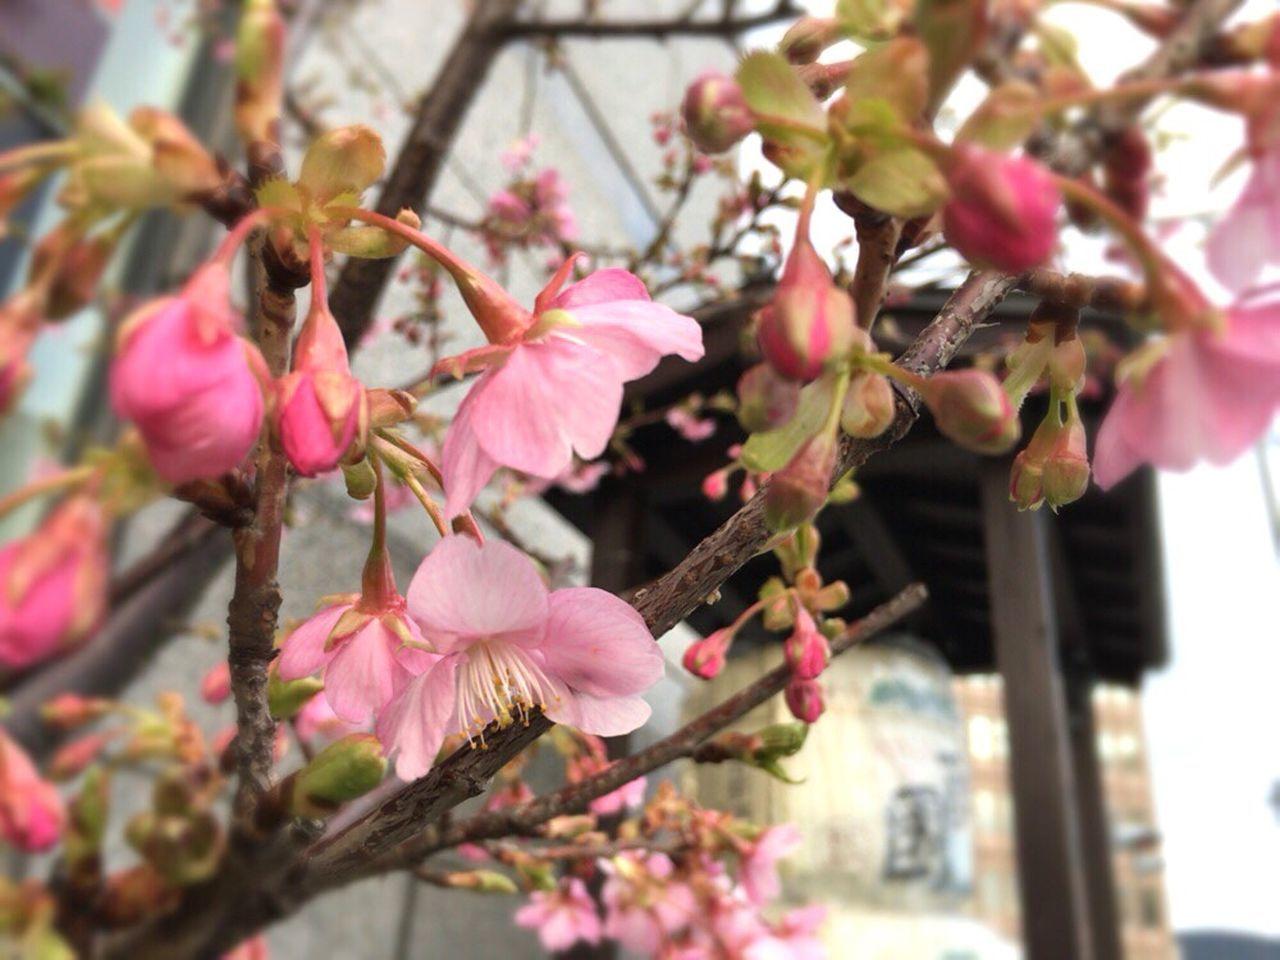 Kyoto Spling Flower Sakura 2017 Kyoto Cherry Blossom Cherry Blossom Cherry Blossoms Kyoto,japan Kyoto Spling Kyoto Sakura Kyoto Sakura 2017 February Cherry Blossoms February Sakura Kyoto City